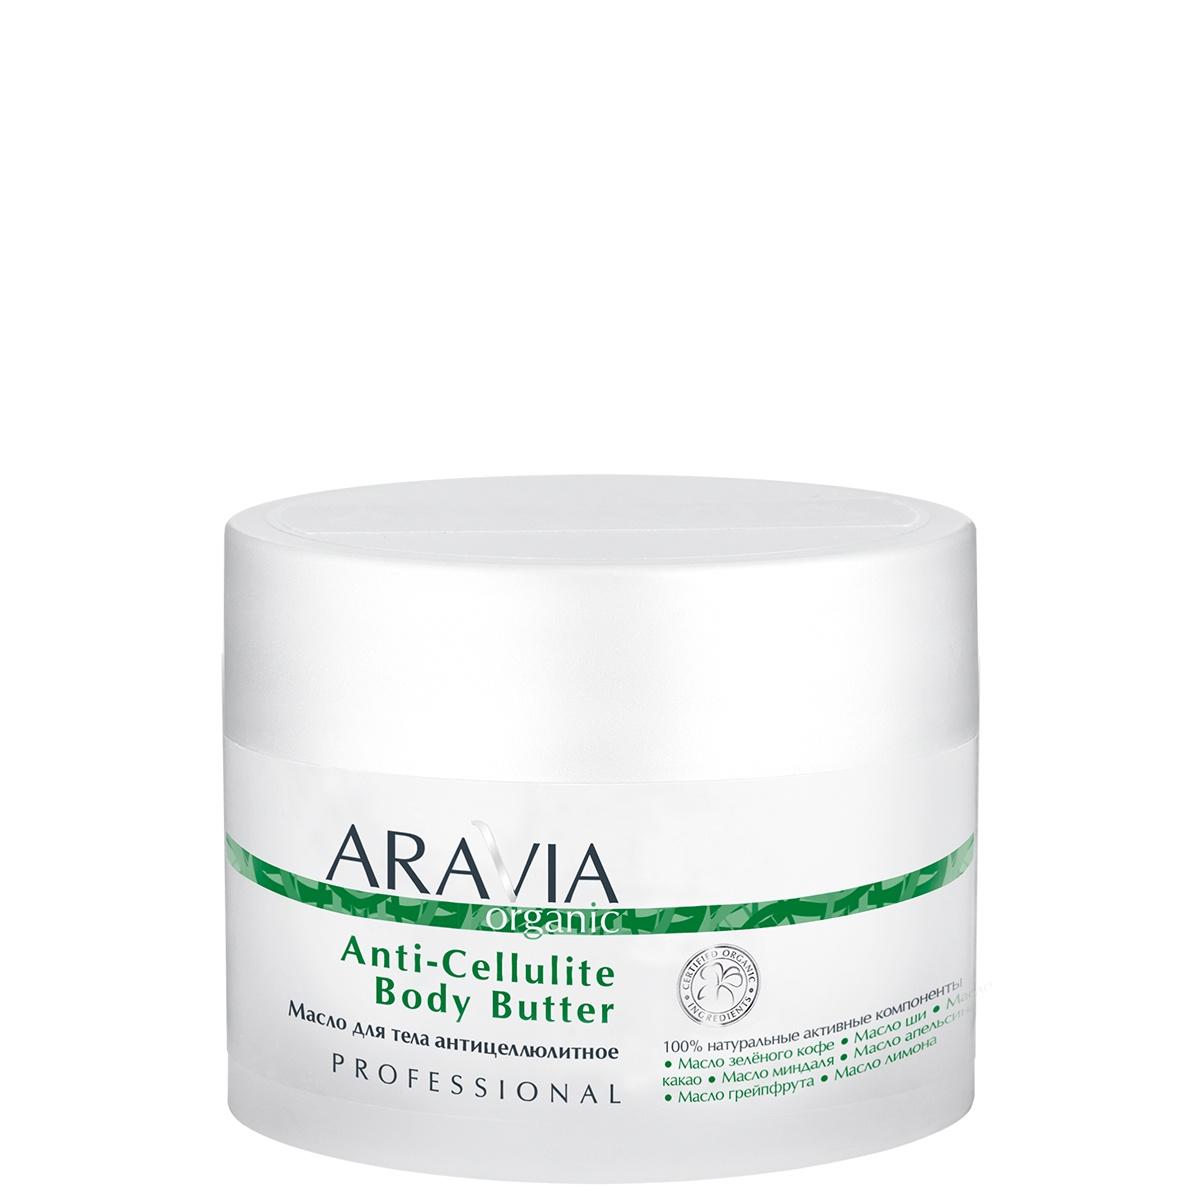 Масло для тела антицеллюлитное Anti-Cellulite Body Butter, 150 мл